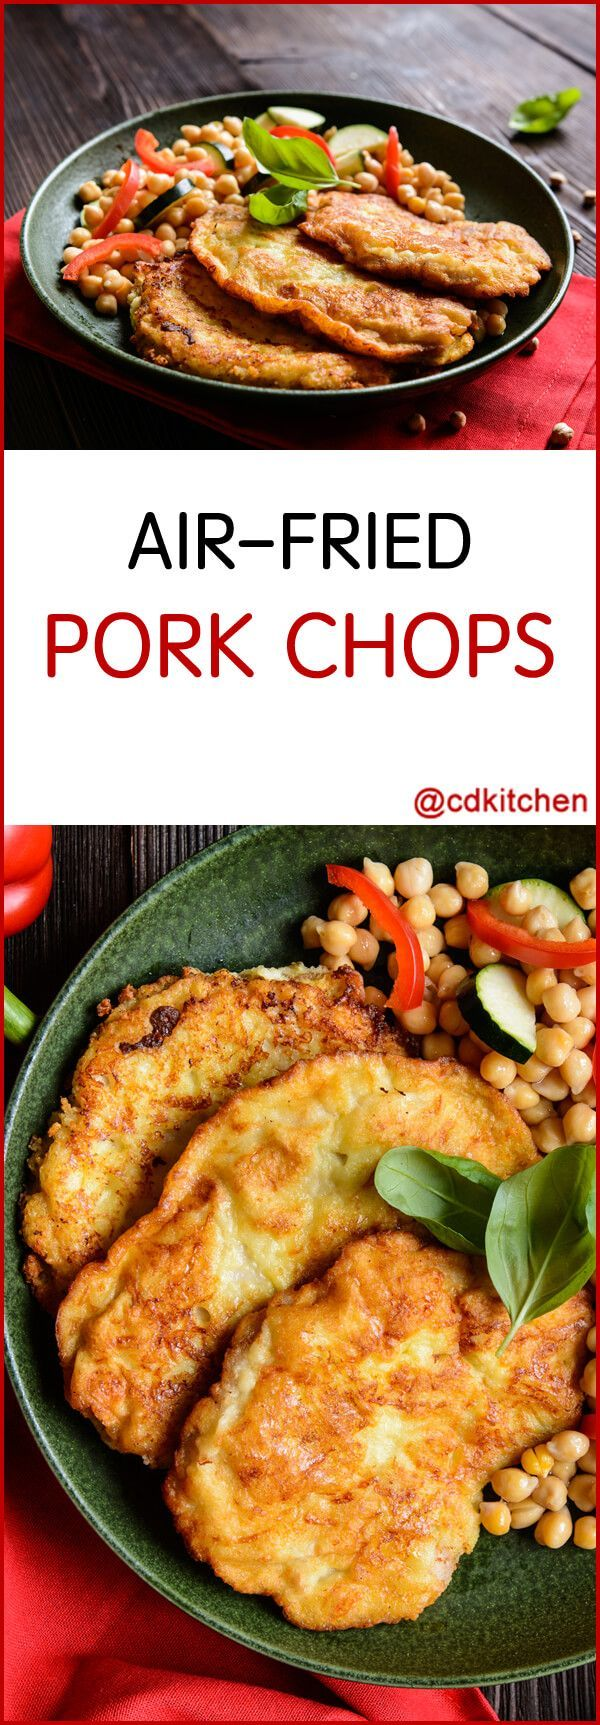 Air-Fried Pork Chops - Recipe is made with cayenne pepper, black pepper, salt, pork loin chops, Dijon mustard, bread crumbs | CDKitchen.com